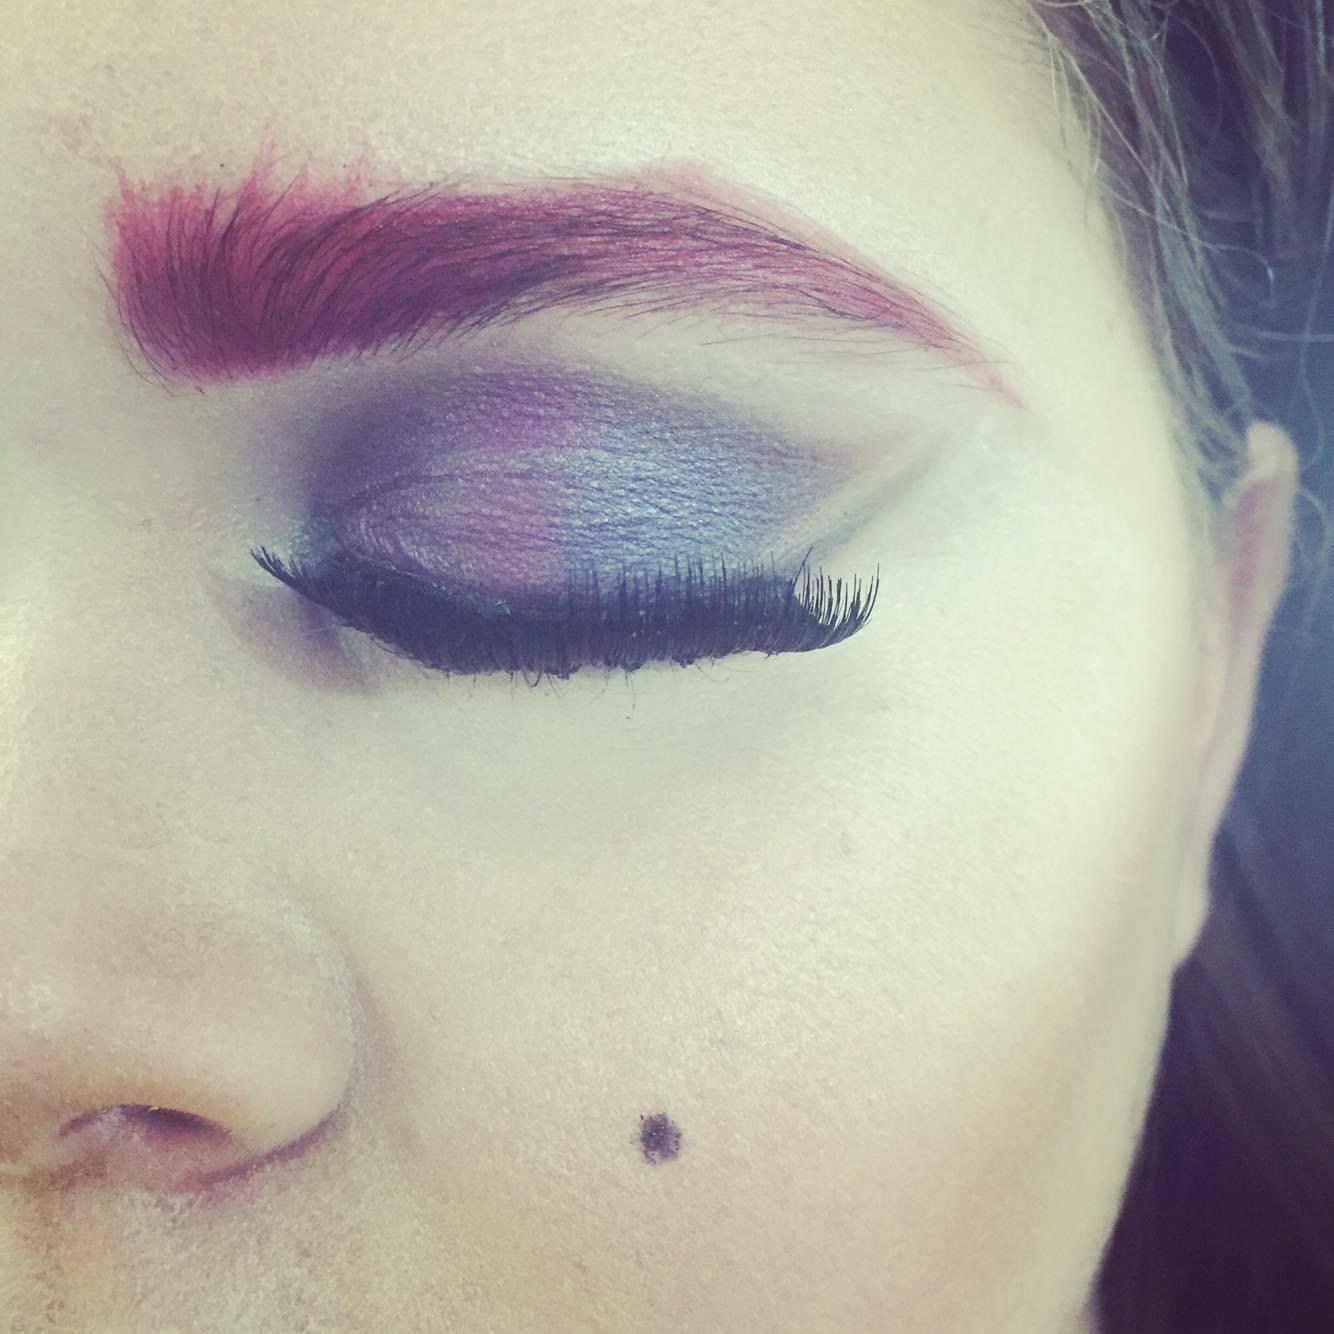 beauty blogger makeup content creation 2